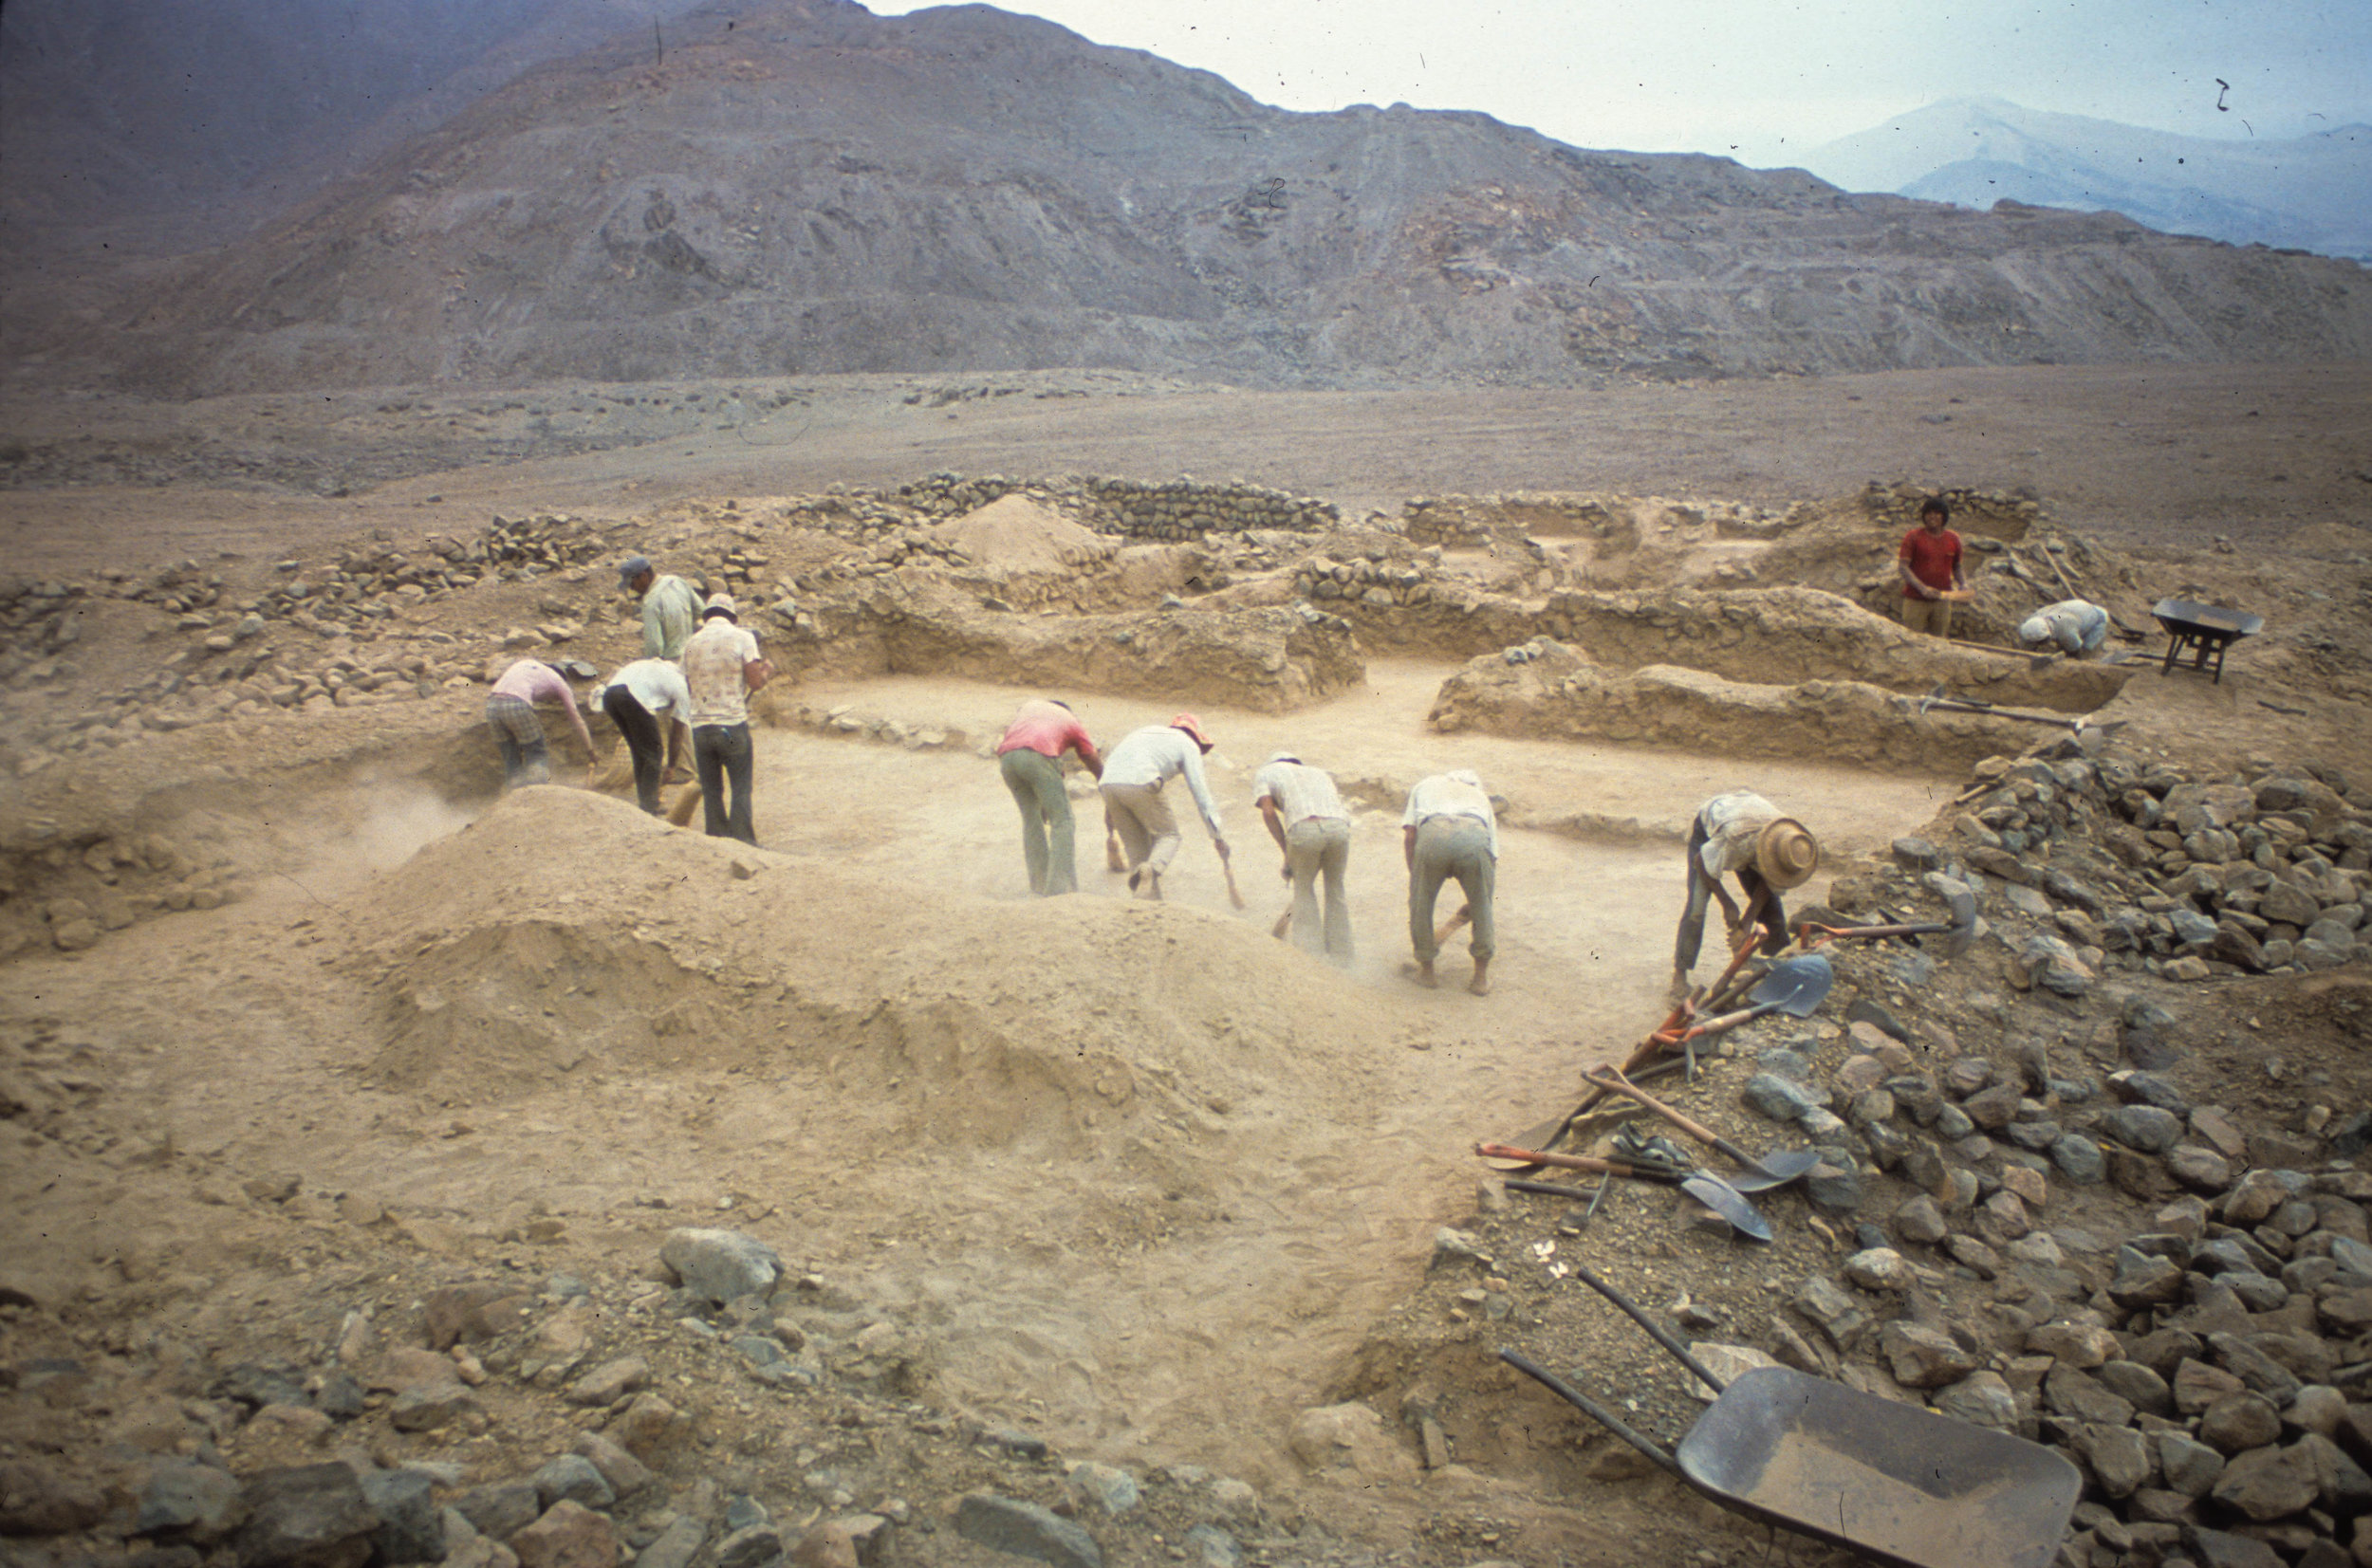 Keatinge and Conrad excavation at Talambo   |  Jequetepeque Valley     (Photo courtesy of Geoffrey Conrad)